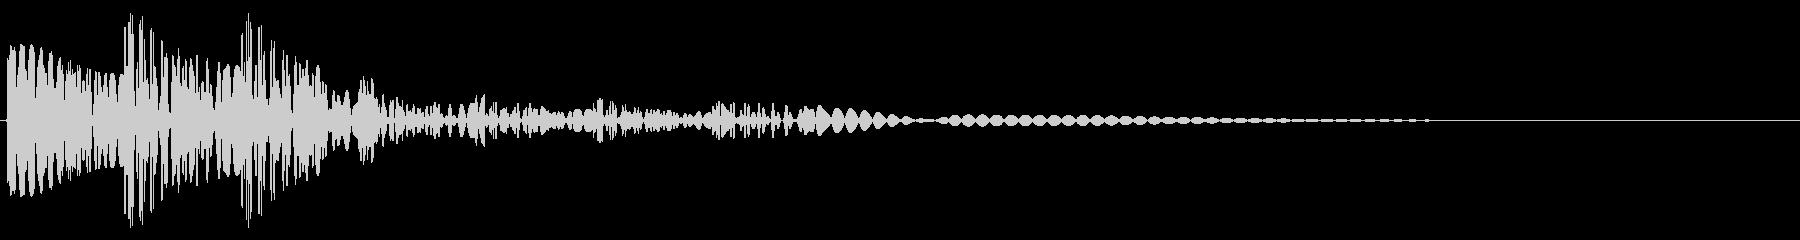 FM音源風効果音(ゴロゴロン)の未再生の波形